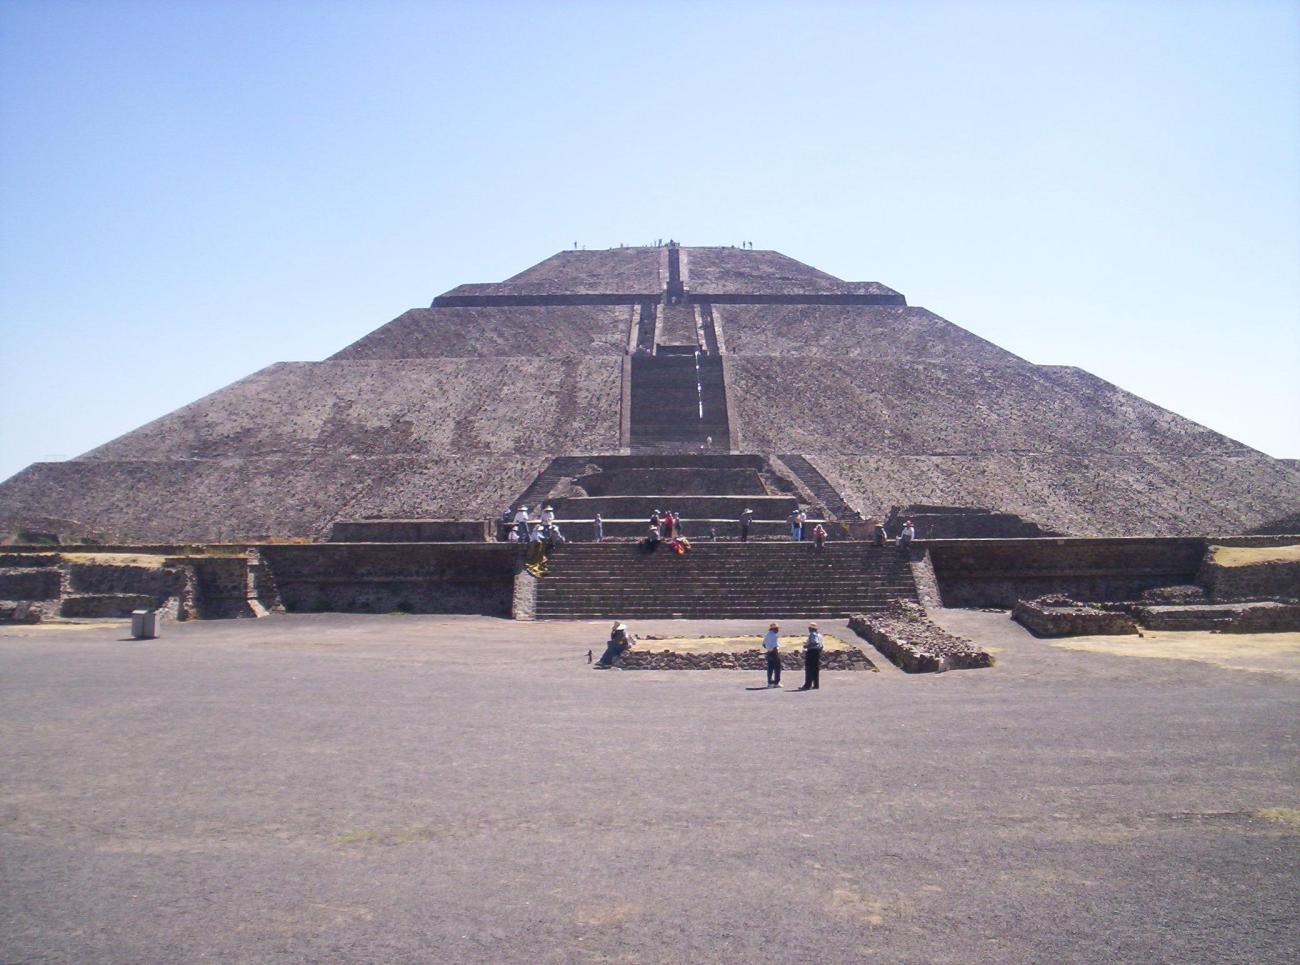 https://xochipilli.files.wordpress.com/2013/12/pirami-del-sol.jpg